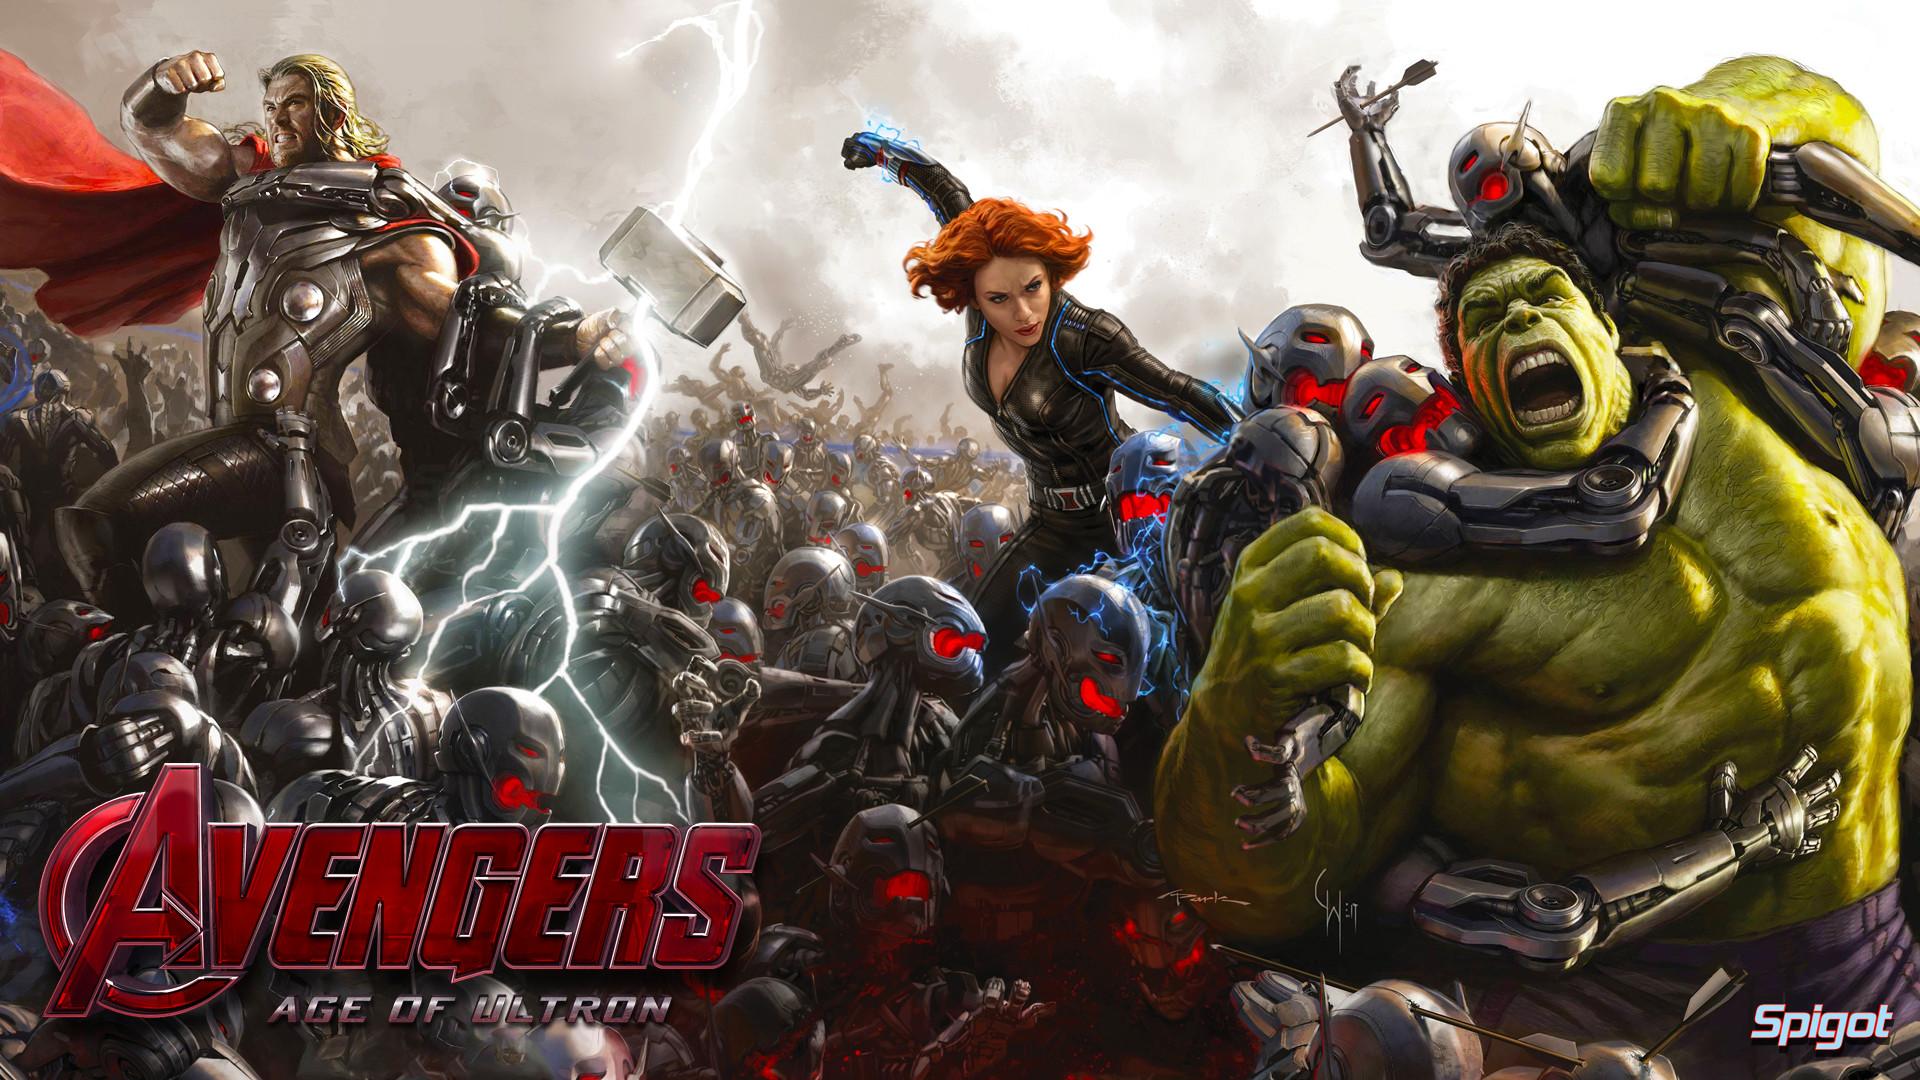 Avengers Age of Ultron Wallpaper